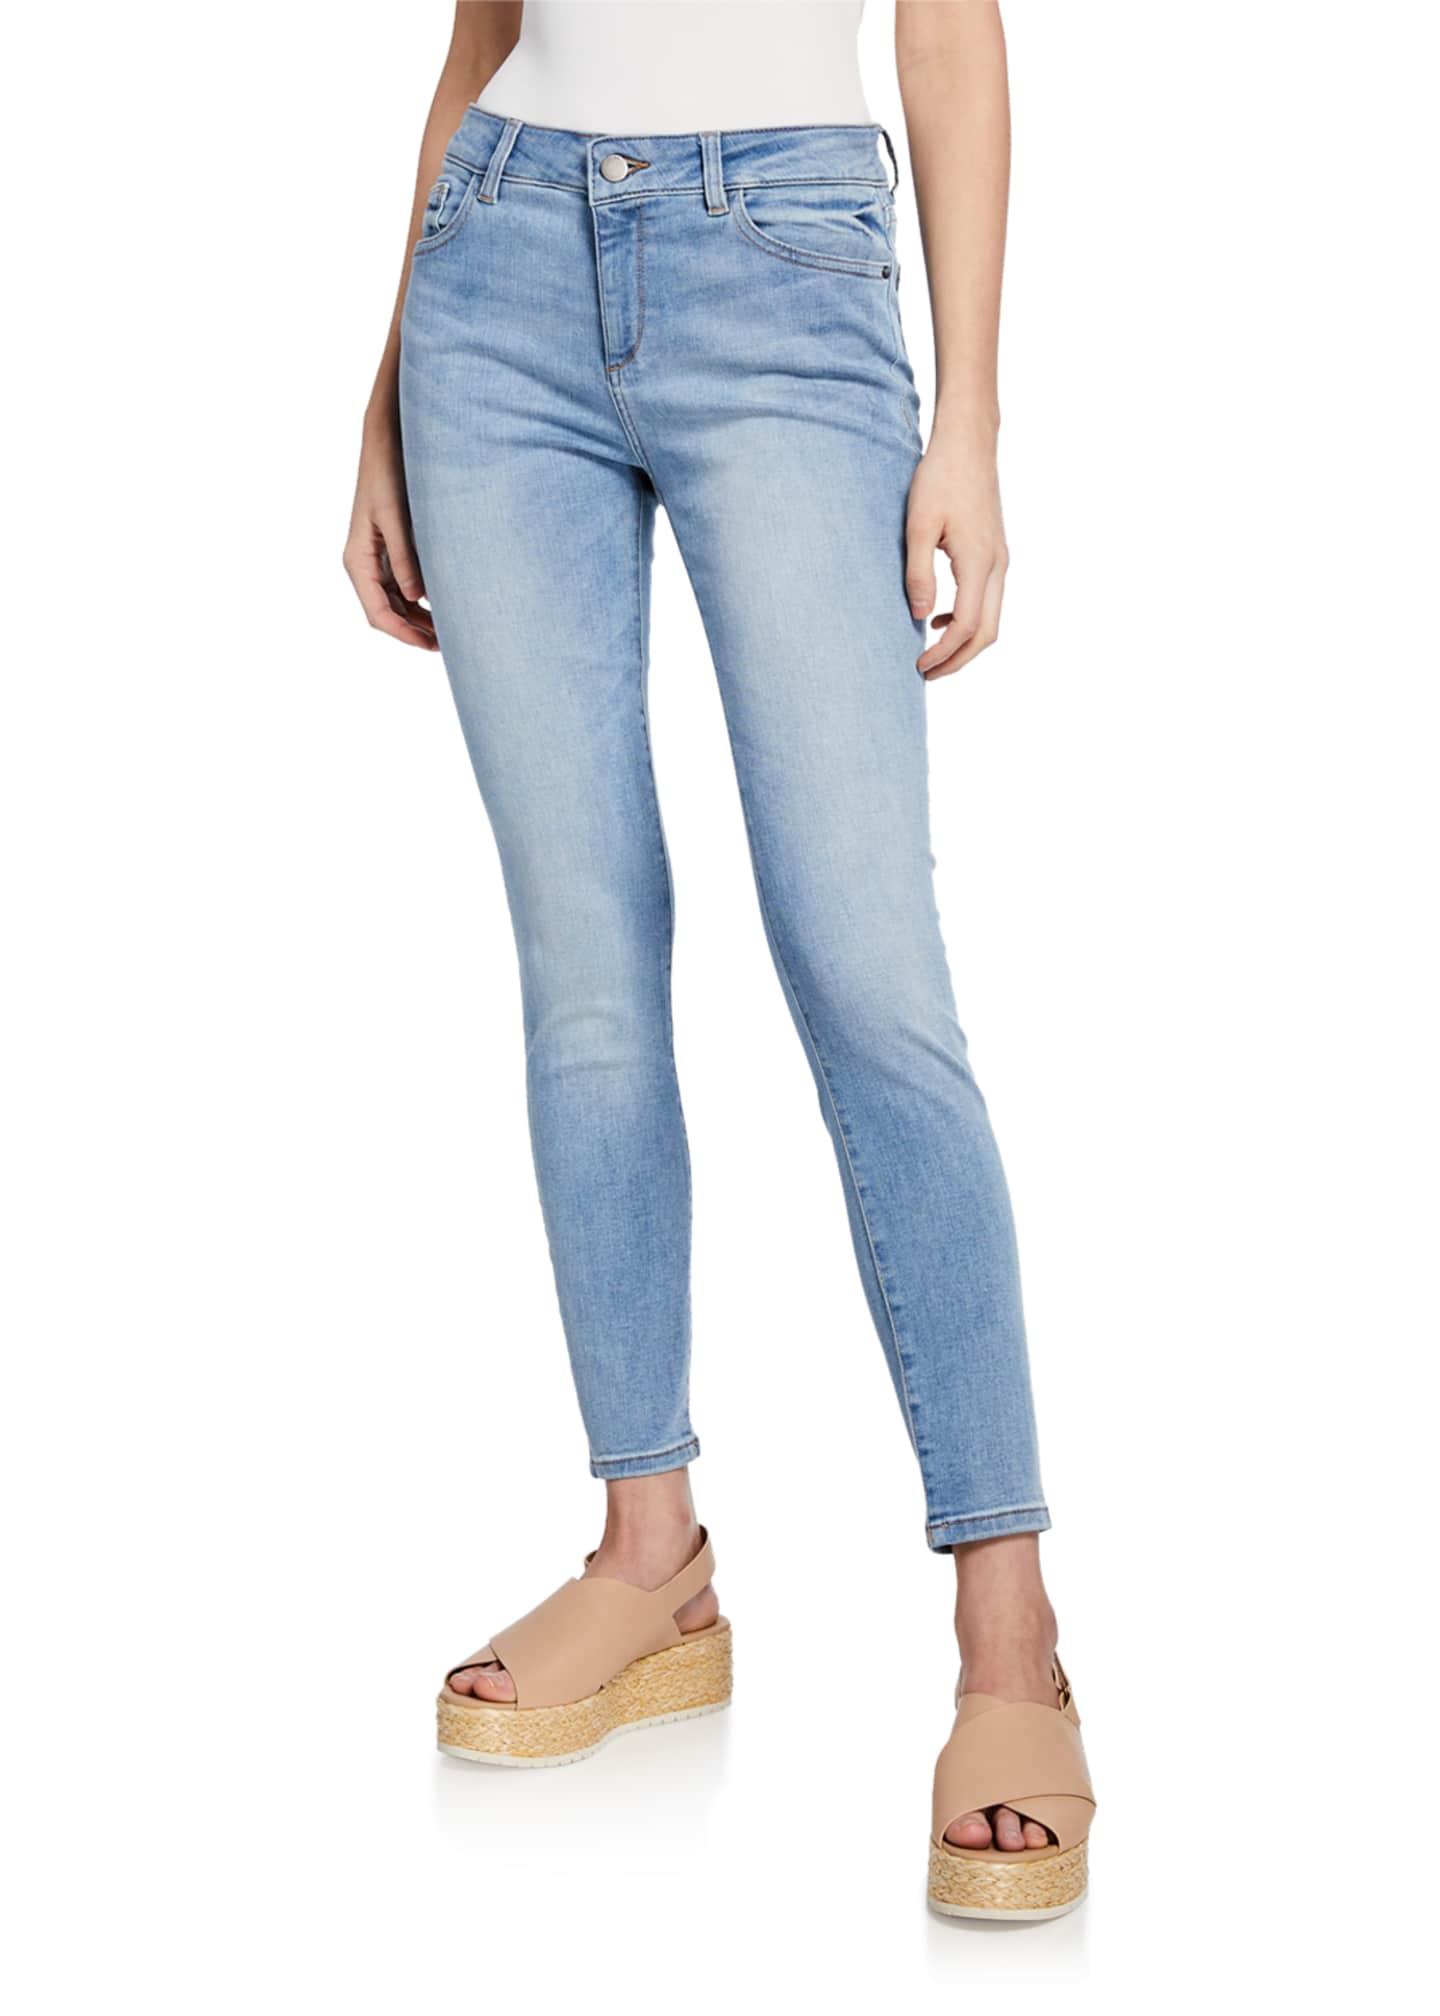 DL1961 Premium Denim Florence Mid-Rise Ankle Skinny Jeans